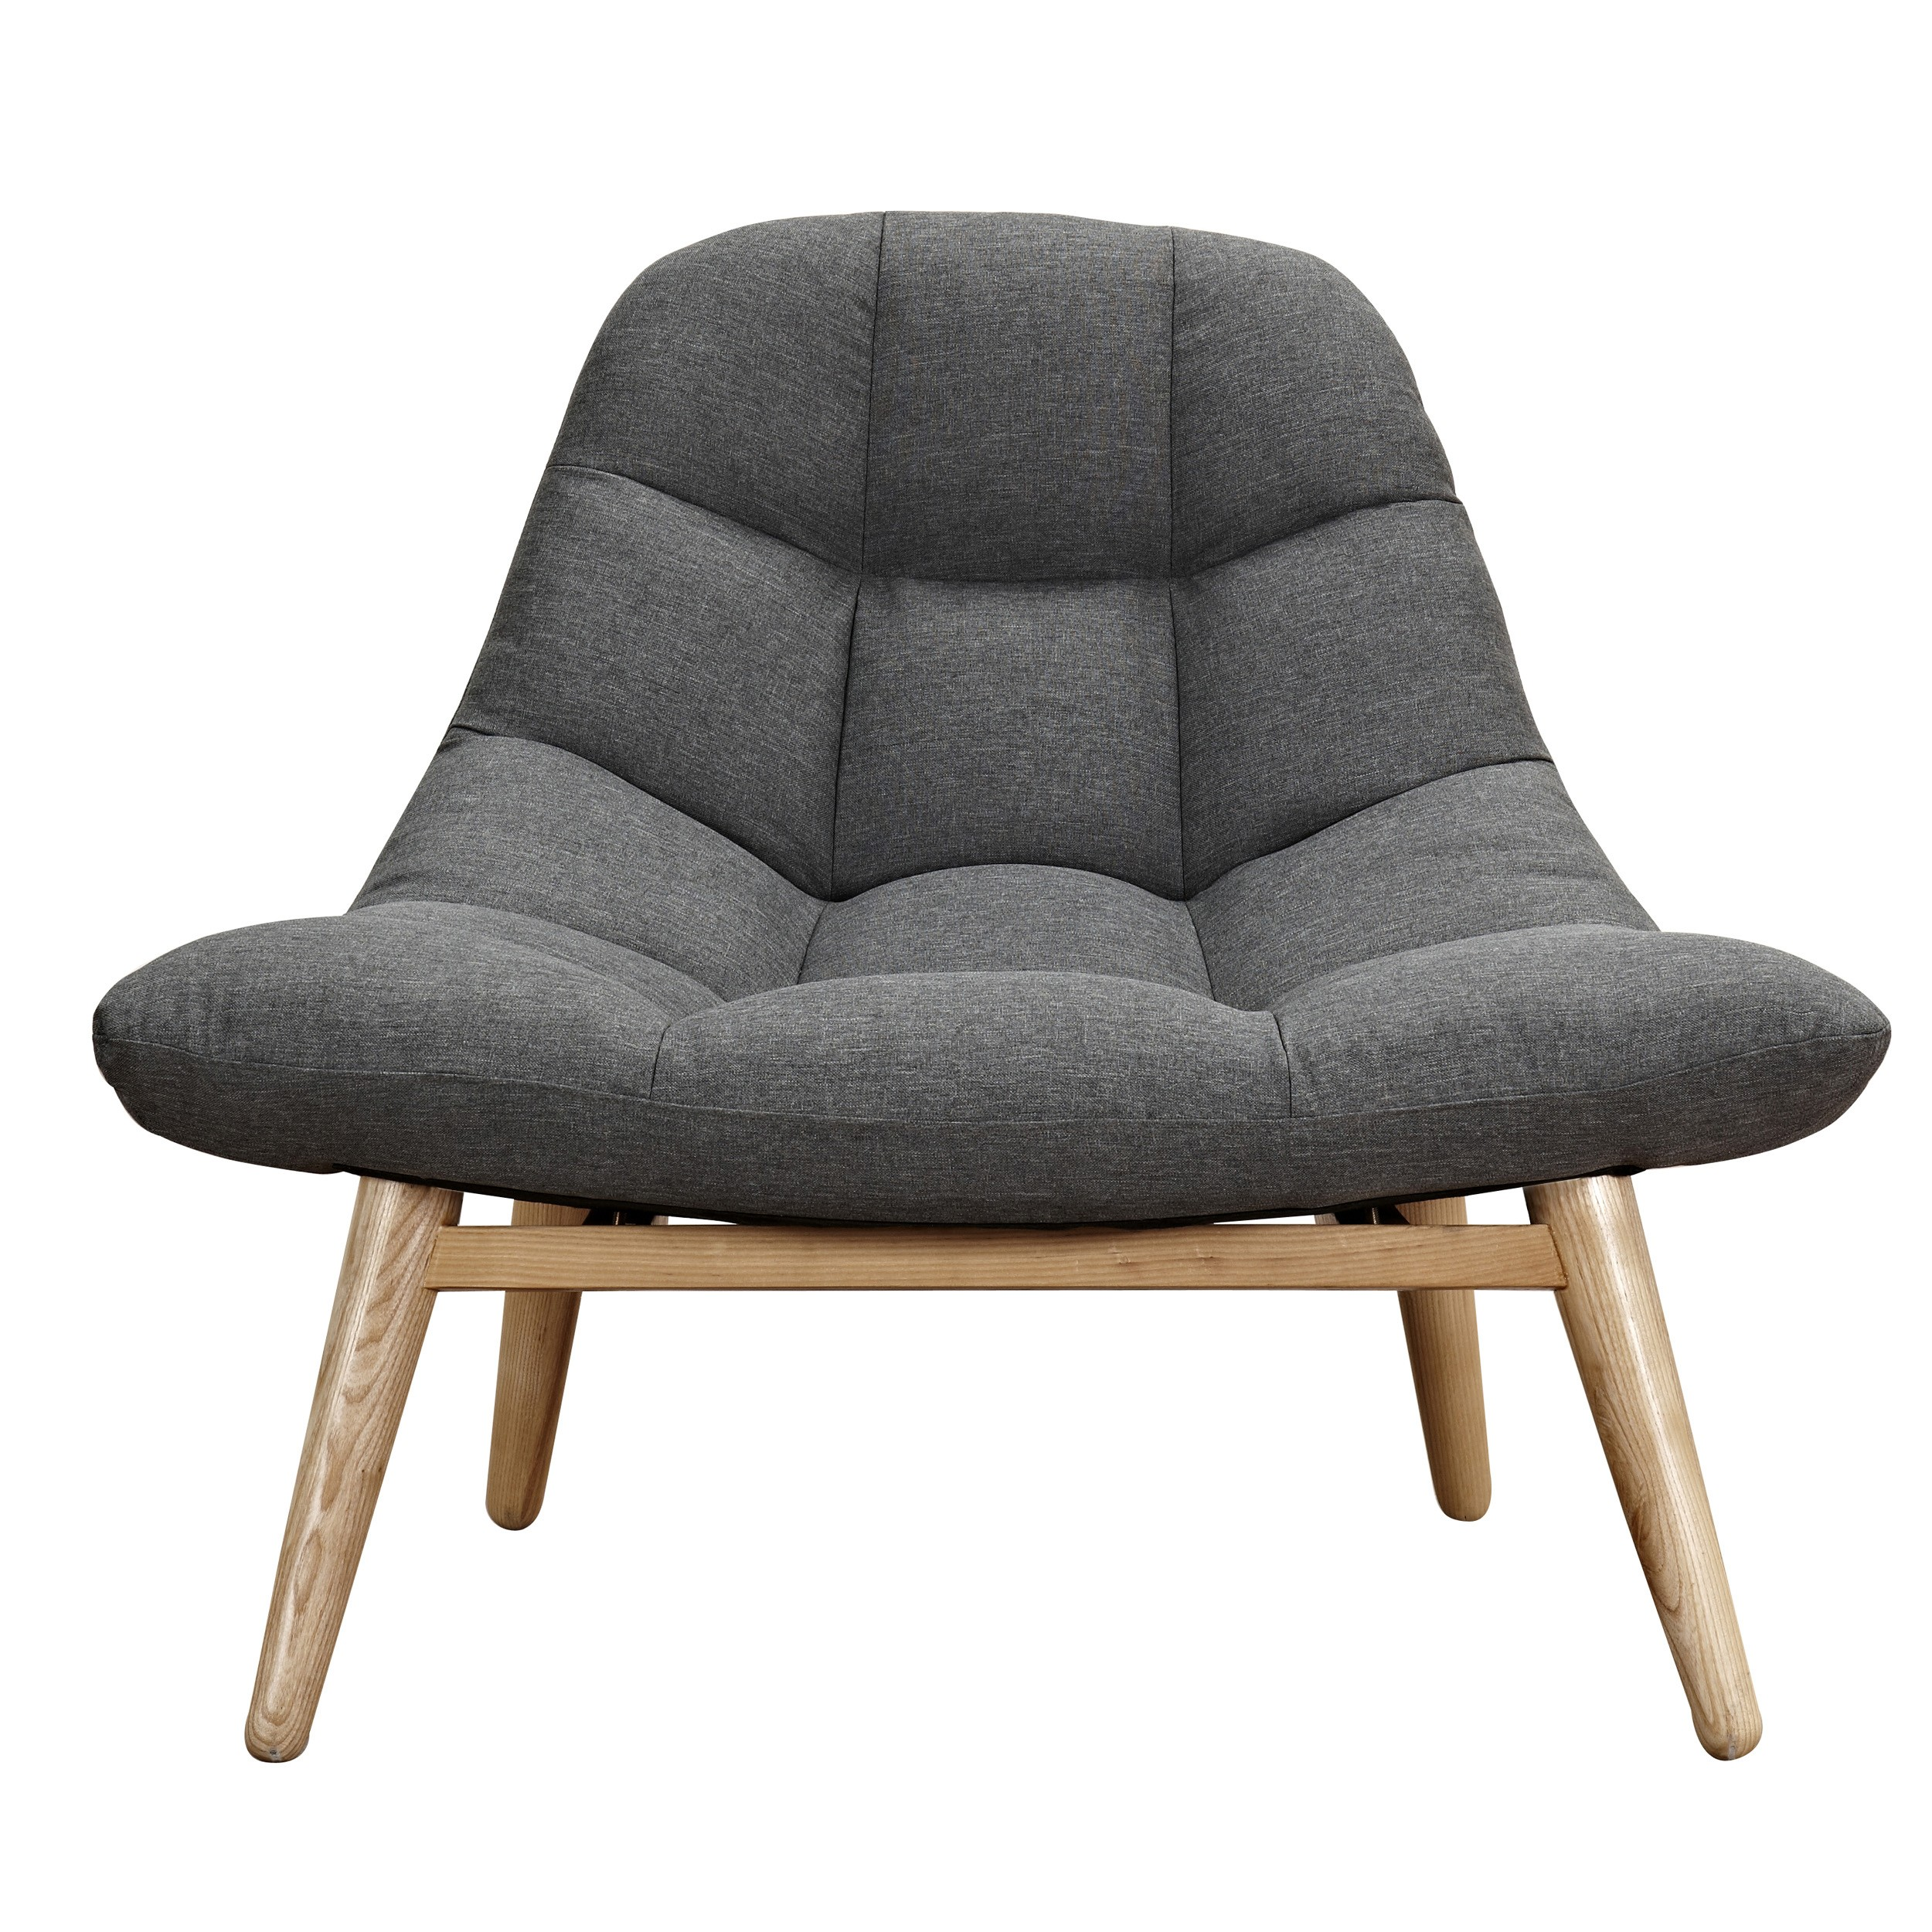 fauteuil melby gris anthracite adopez nos fauteuils melby gris anthracite rdv d co. Black Bedroom Furniture Sets. Home Design Ideas